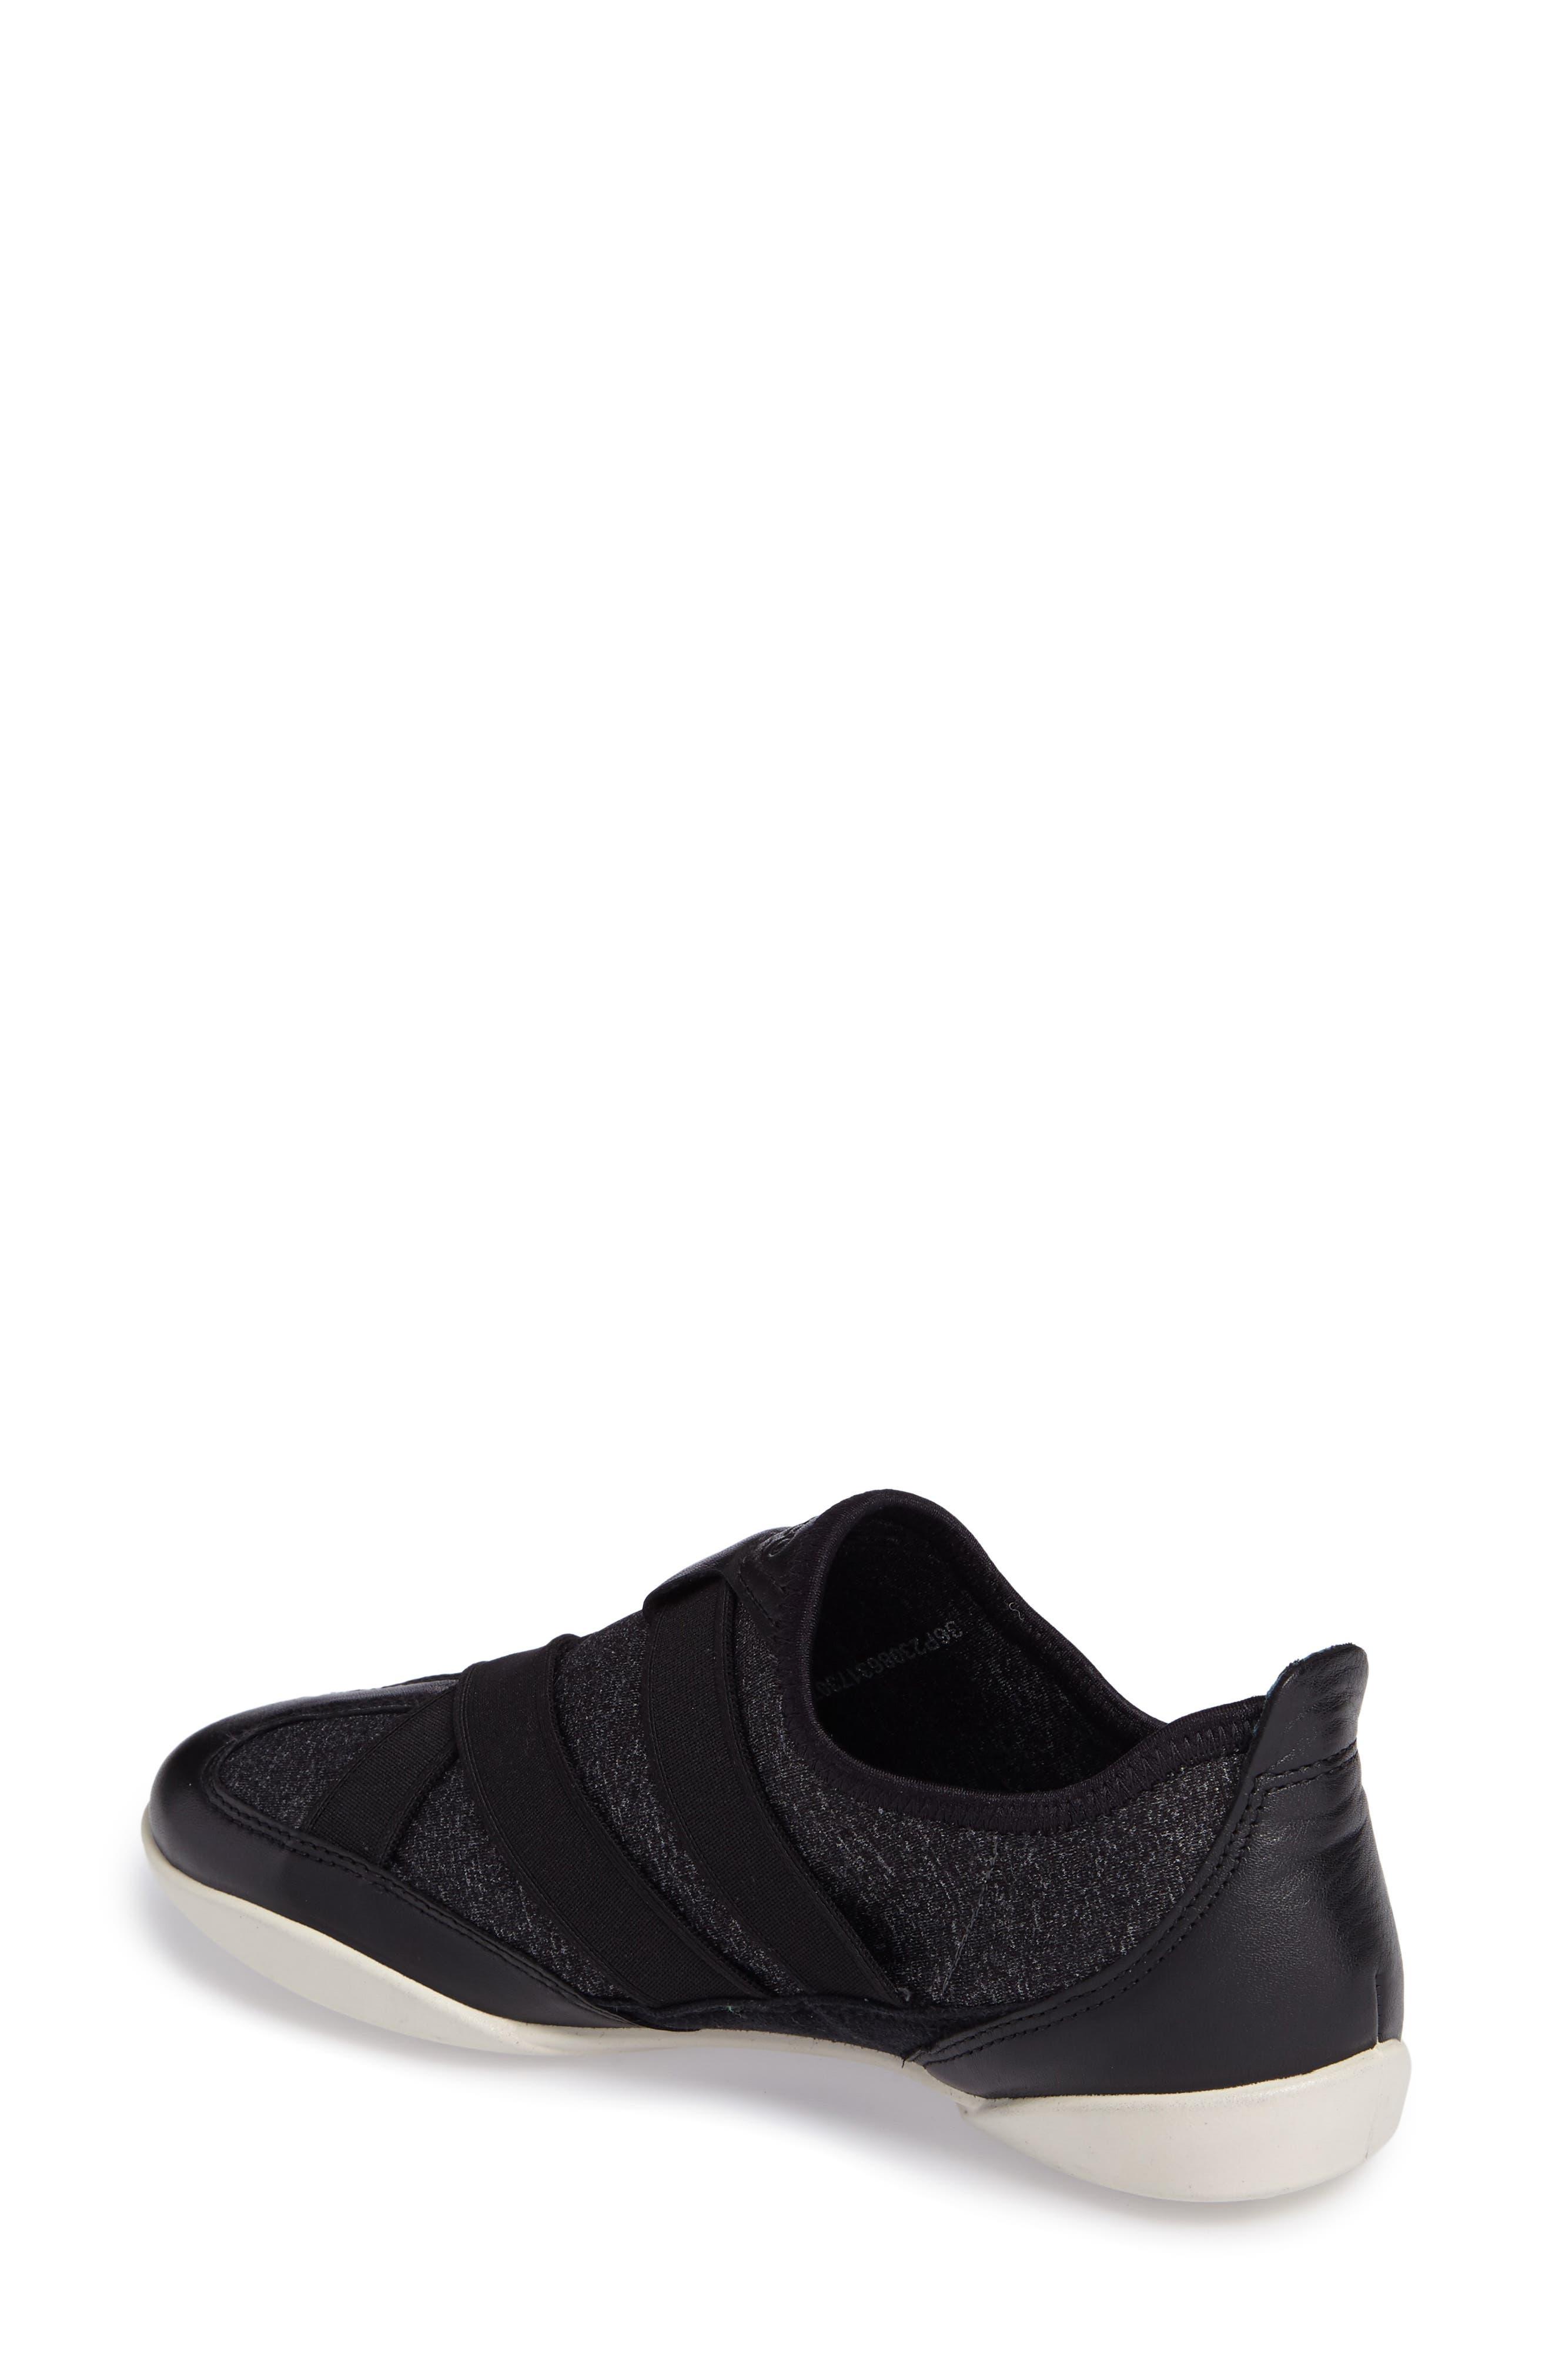 'Bluma' Sneaker,                             Alternate thumbnail 2, color,                             010